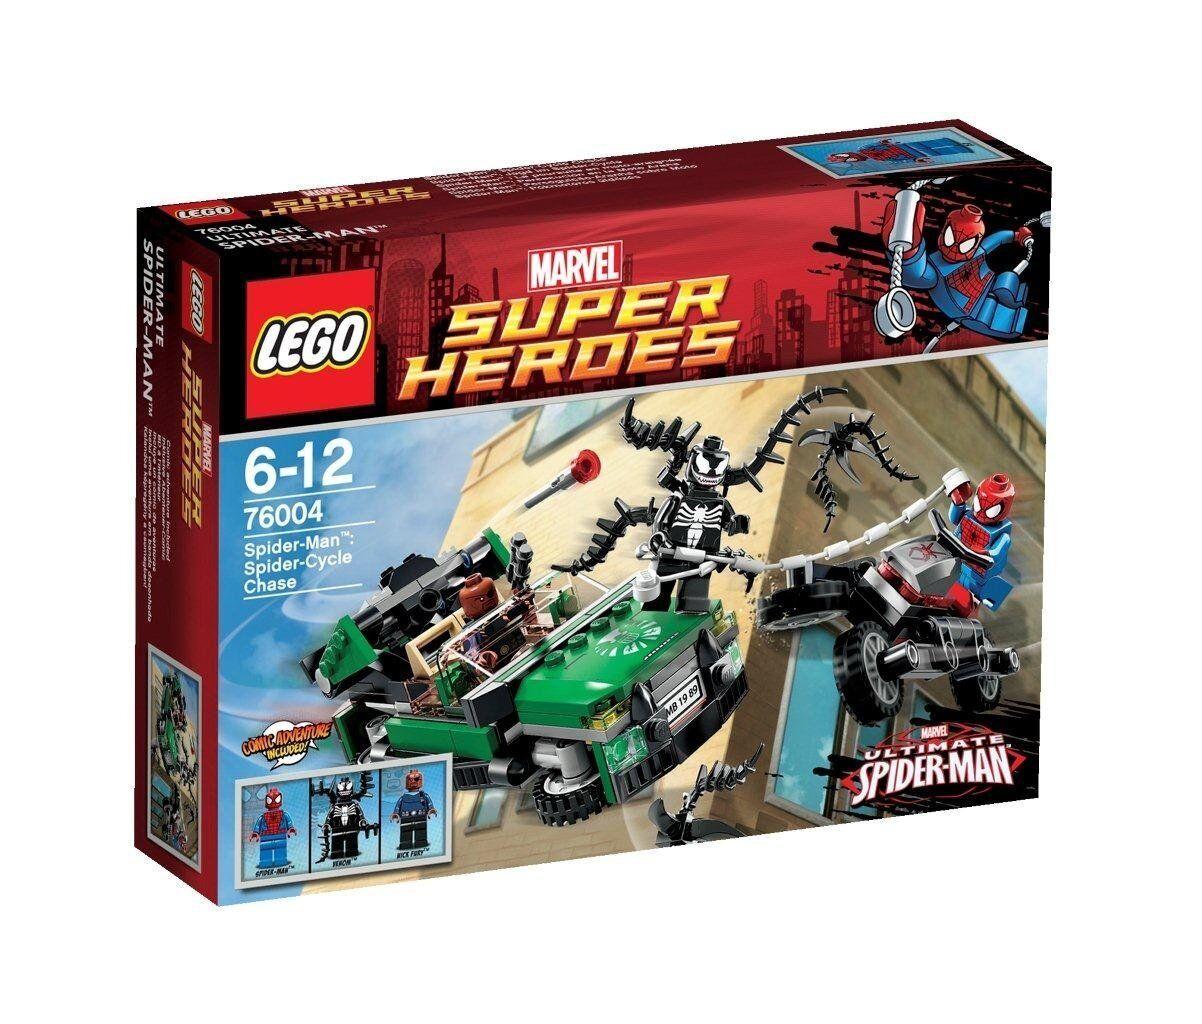 LEGO Super Heroes - Marvel - 76004 - La Moto-Araignée - Spider-Man - Venom